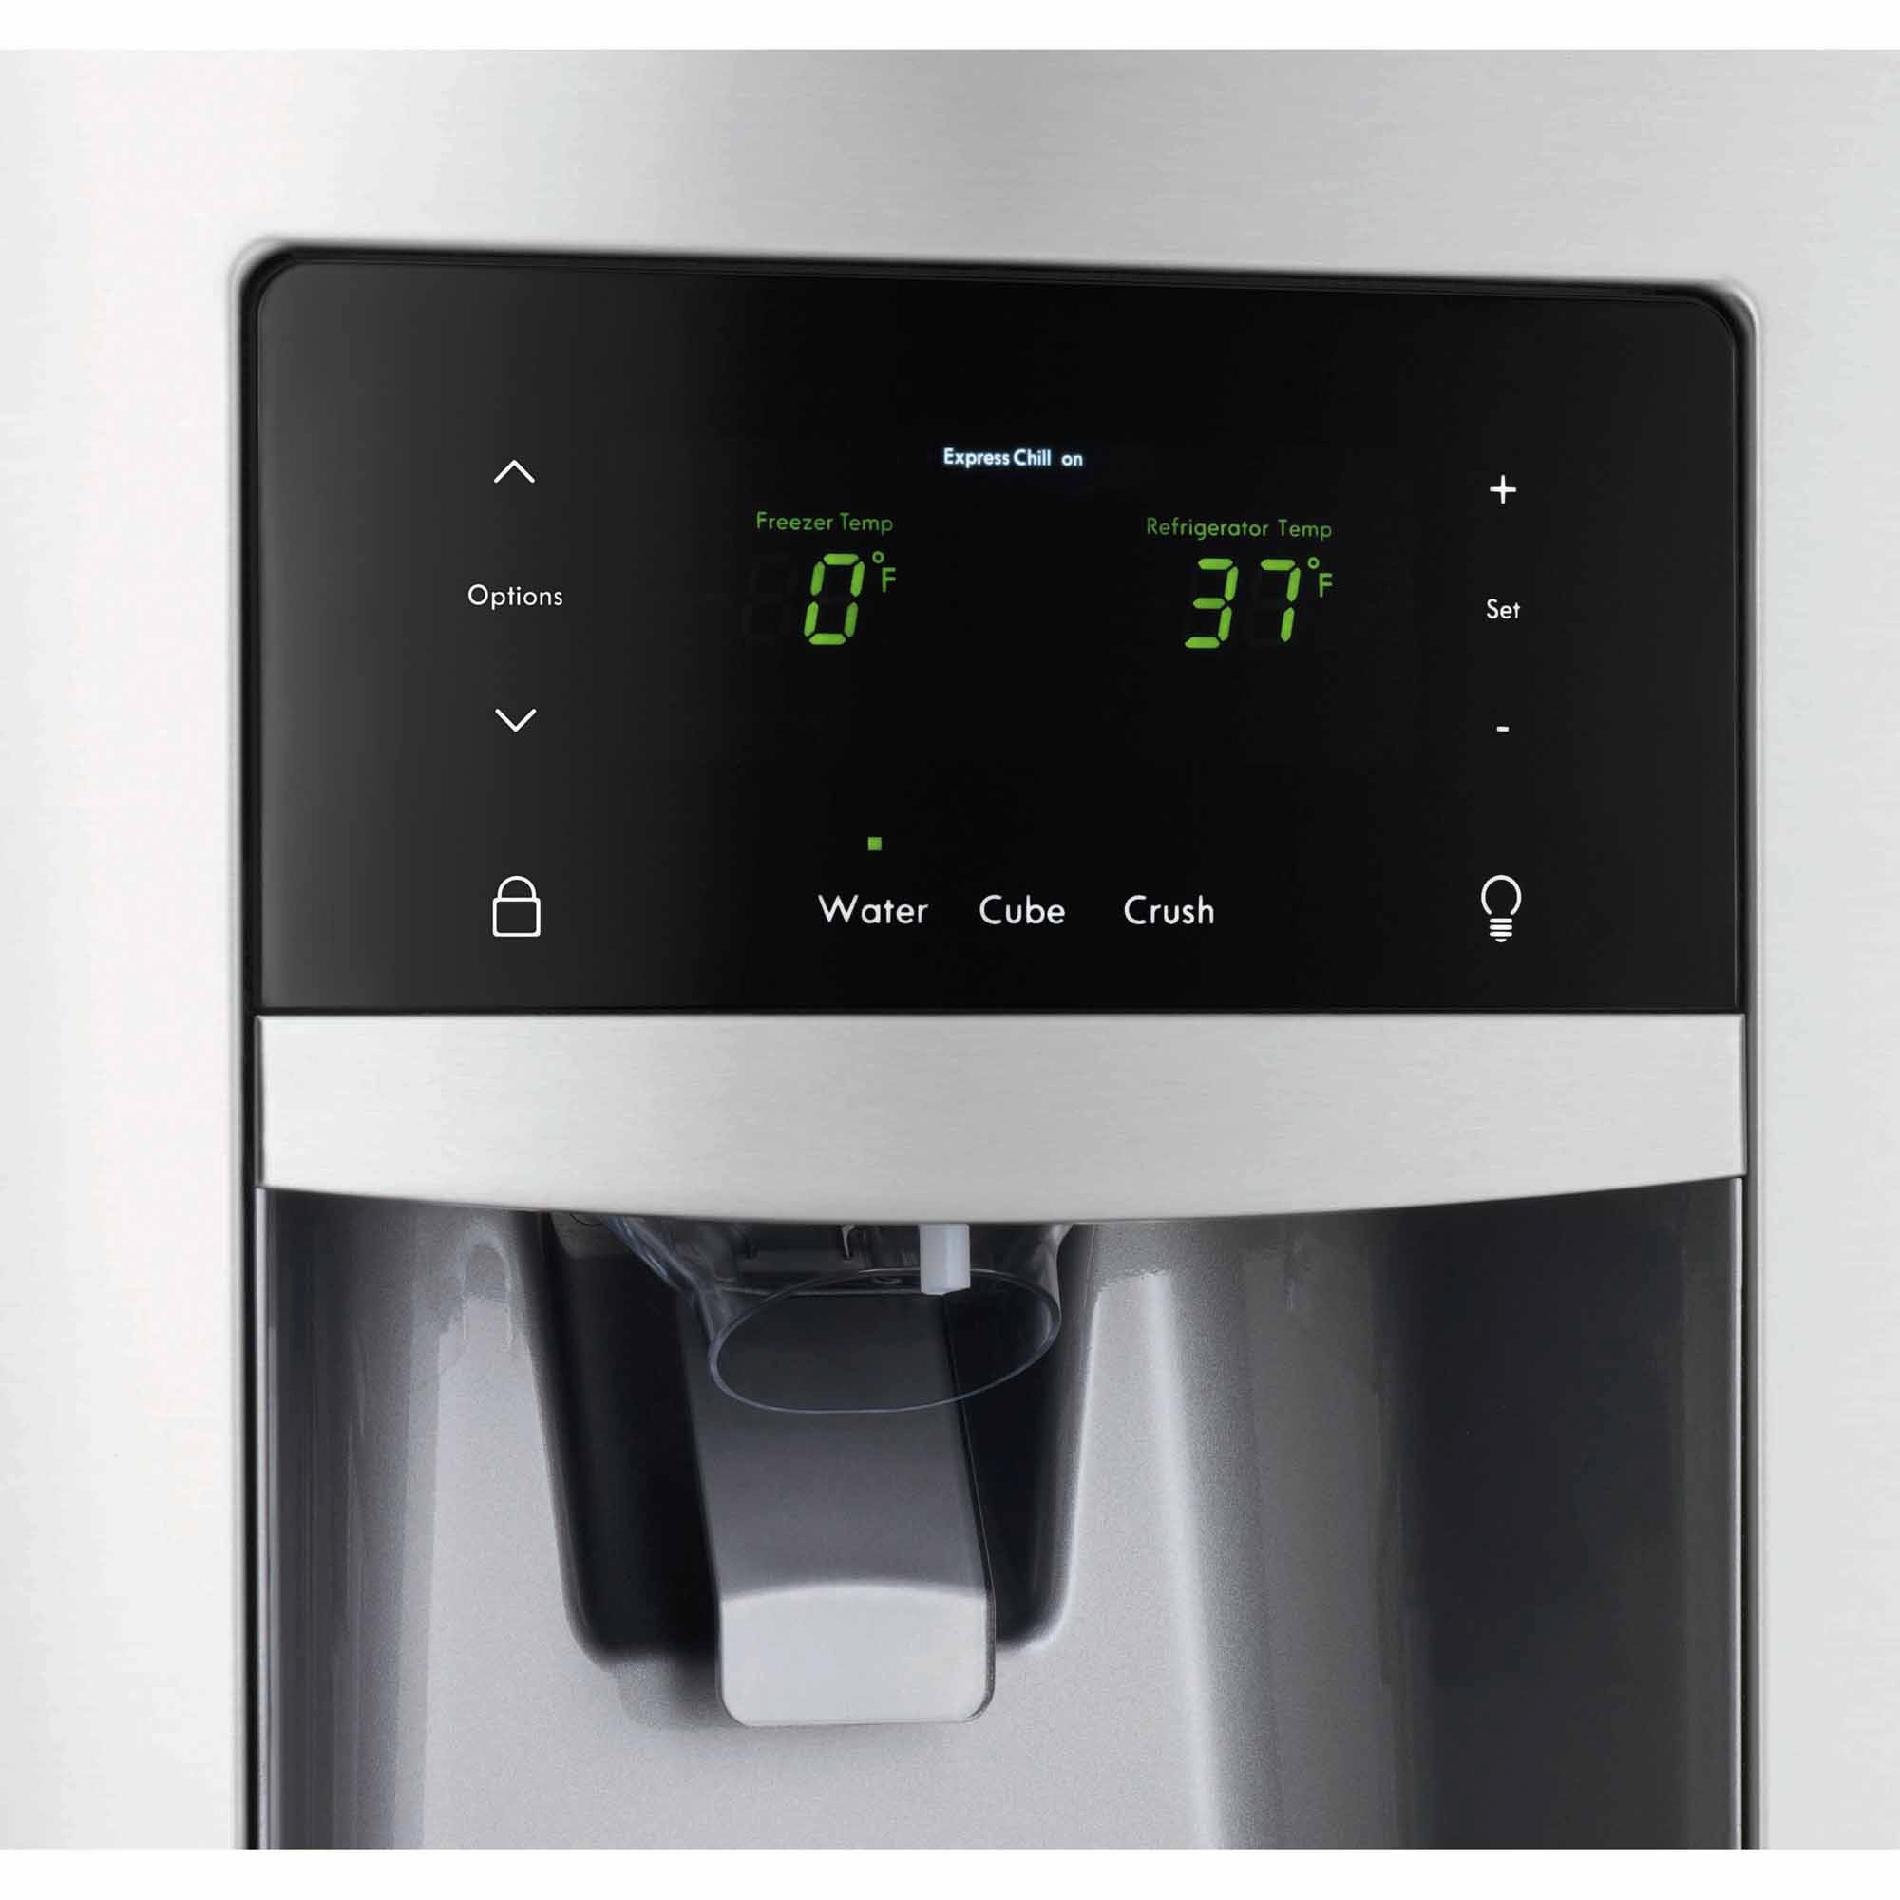 Kenmore 70443 21.9 cu. ft. French Door Refrigerator - Stainless Steel